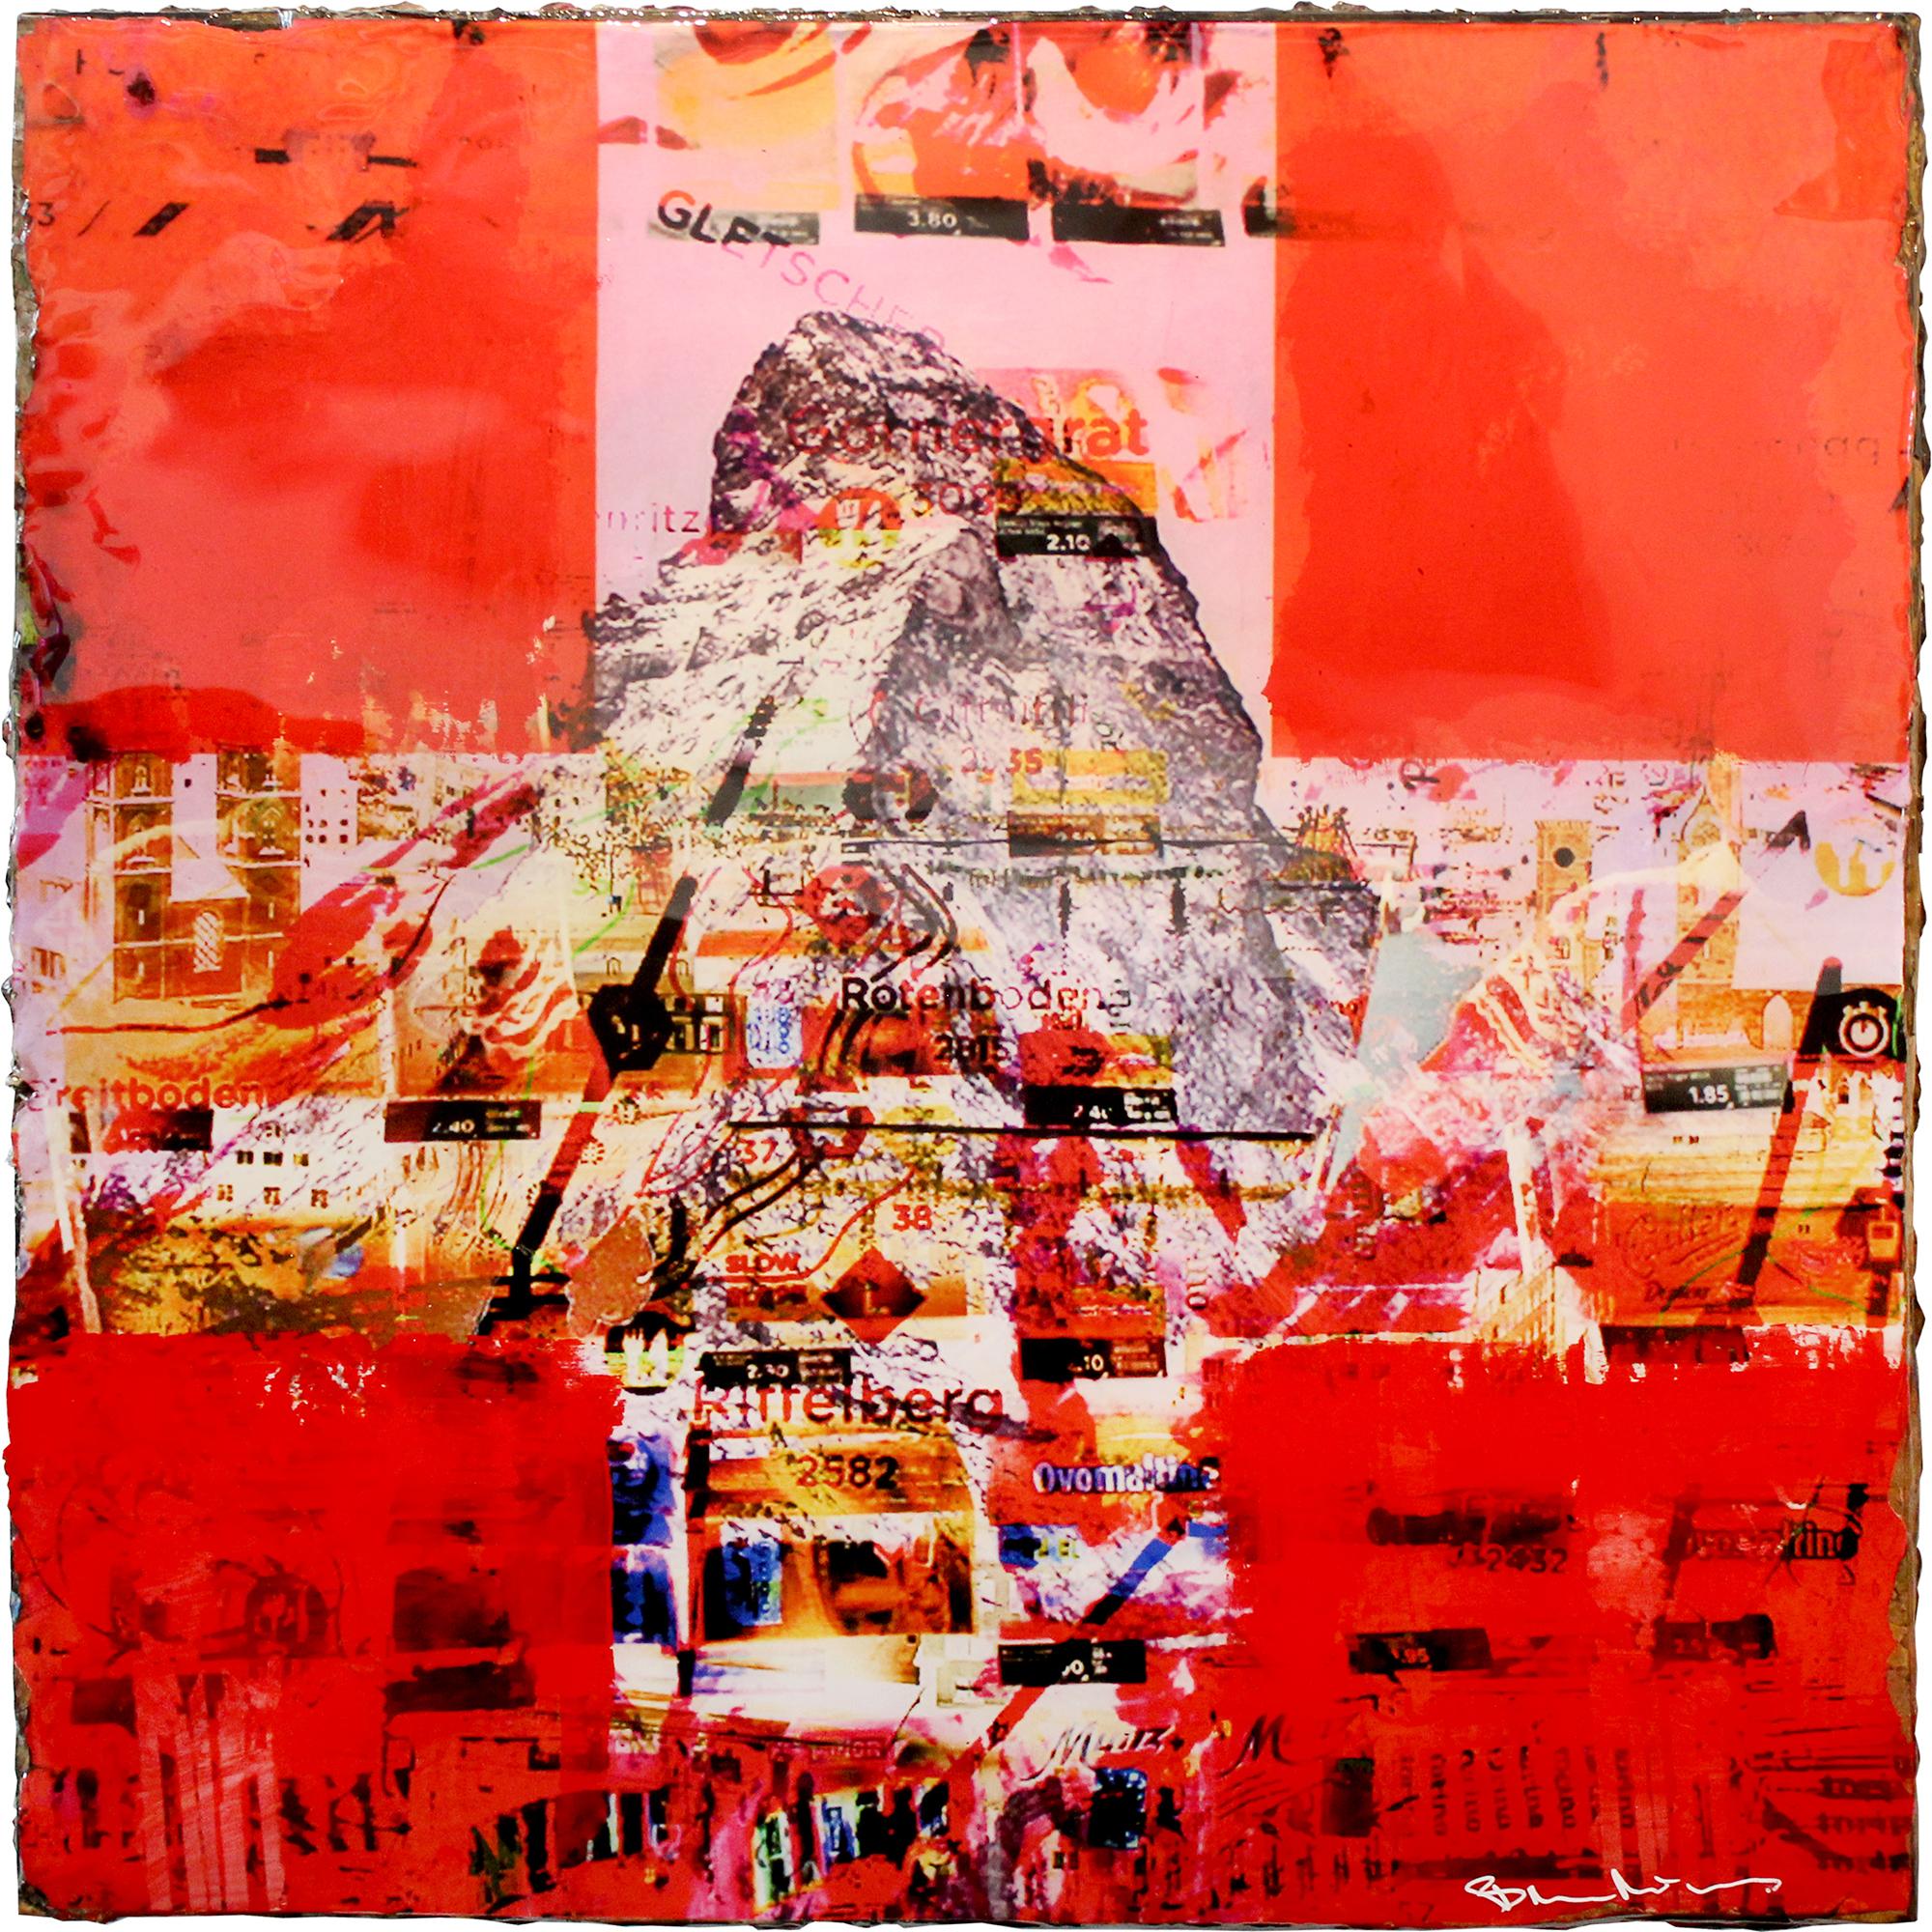 Bram Reijnders - Swiss Love , 8029-012-871